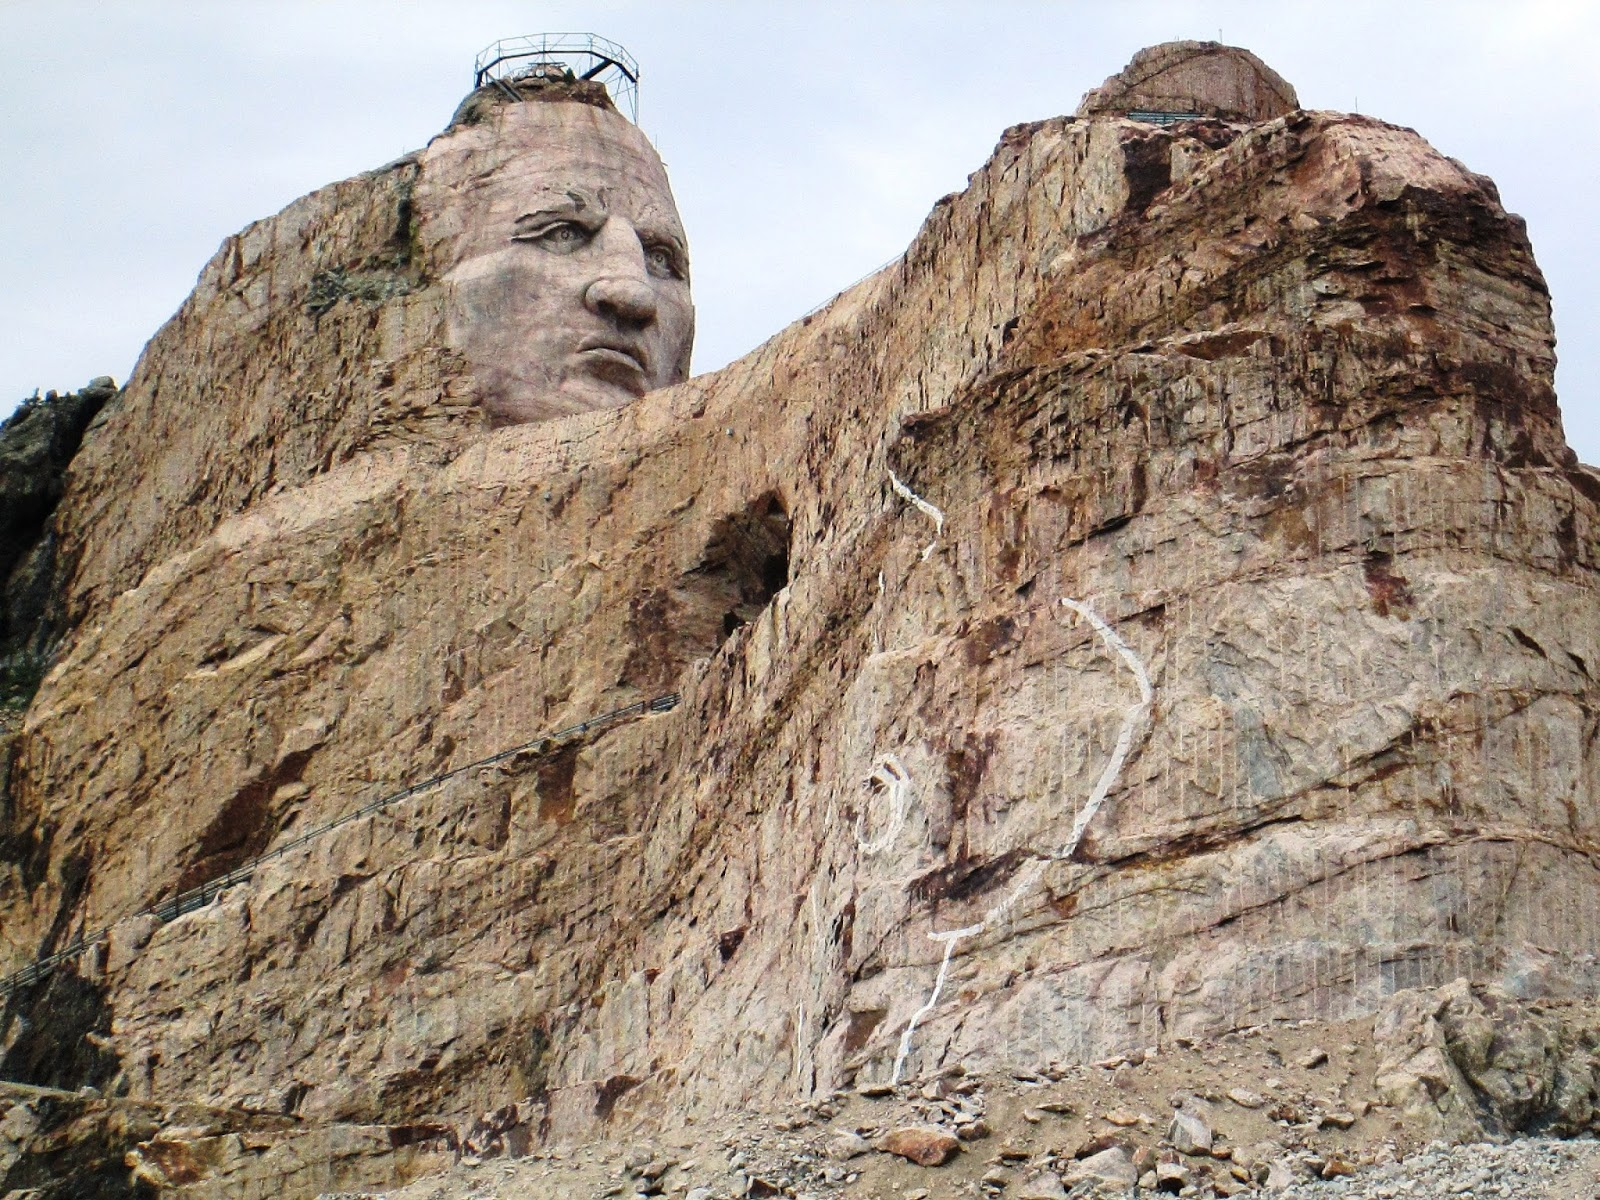 Spirited Mount Rushmore South Dakota National Memorial The Black Hills Comm Bronze Medal Medals